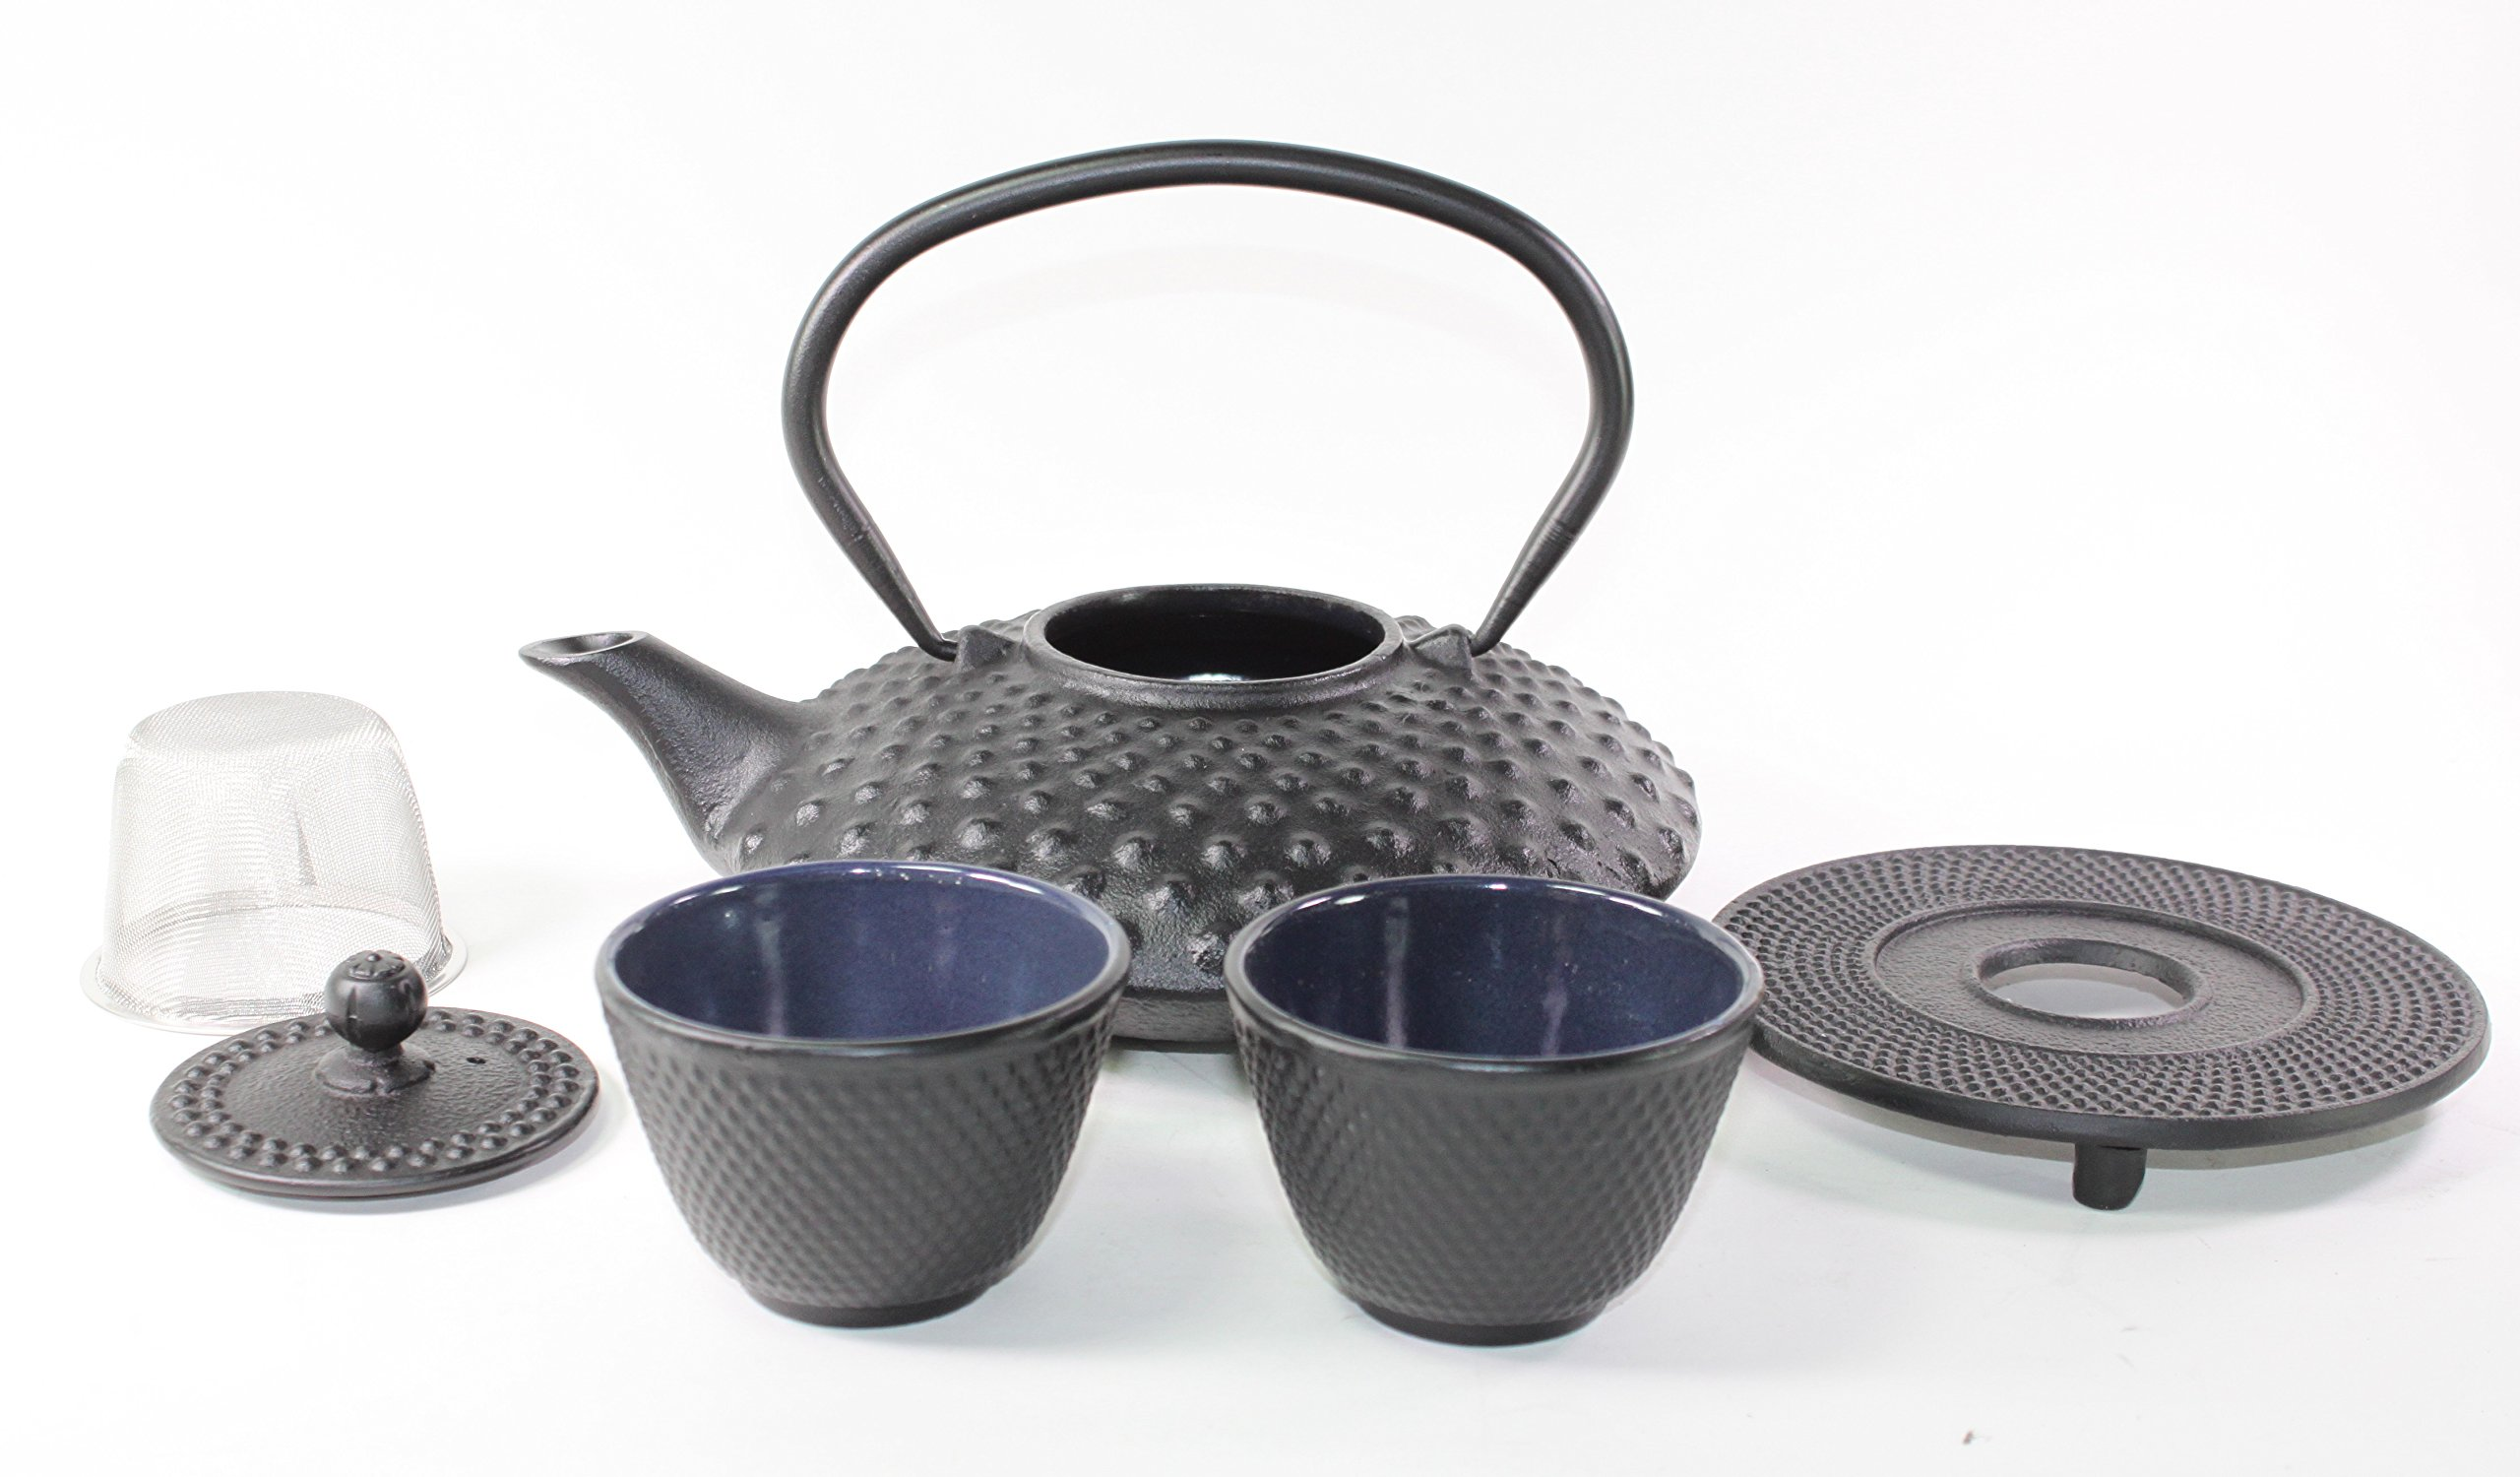 Japanese Antique 24 Fl Oz Black Dot Hobnail Cast Iron Teapot Tetsubin with Infuser Tea Set with Trivet